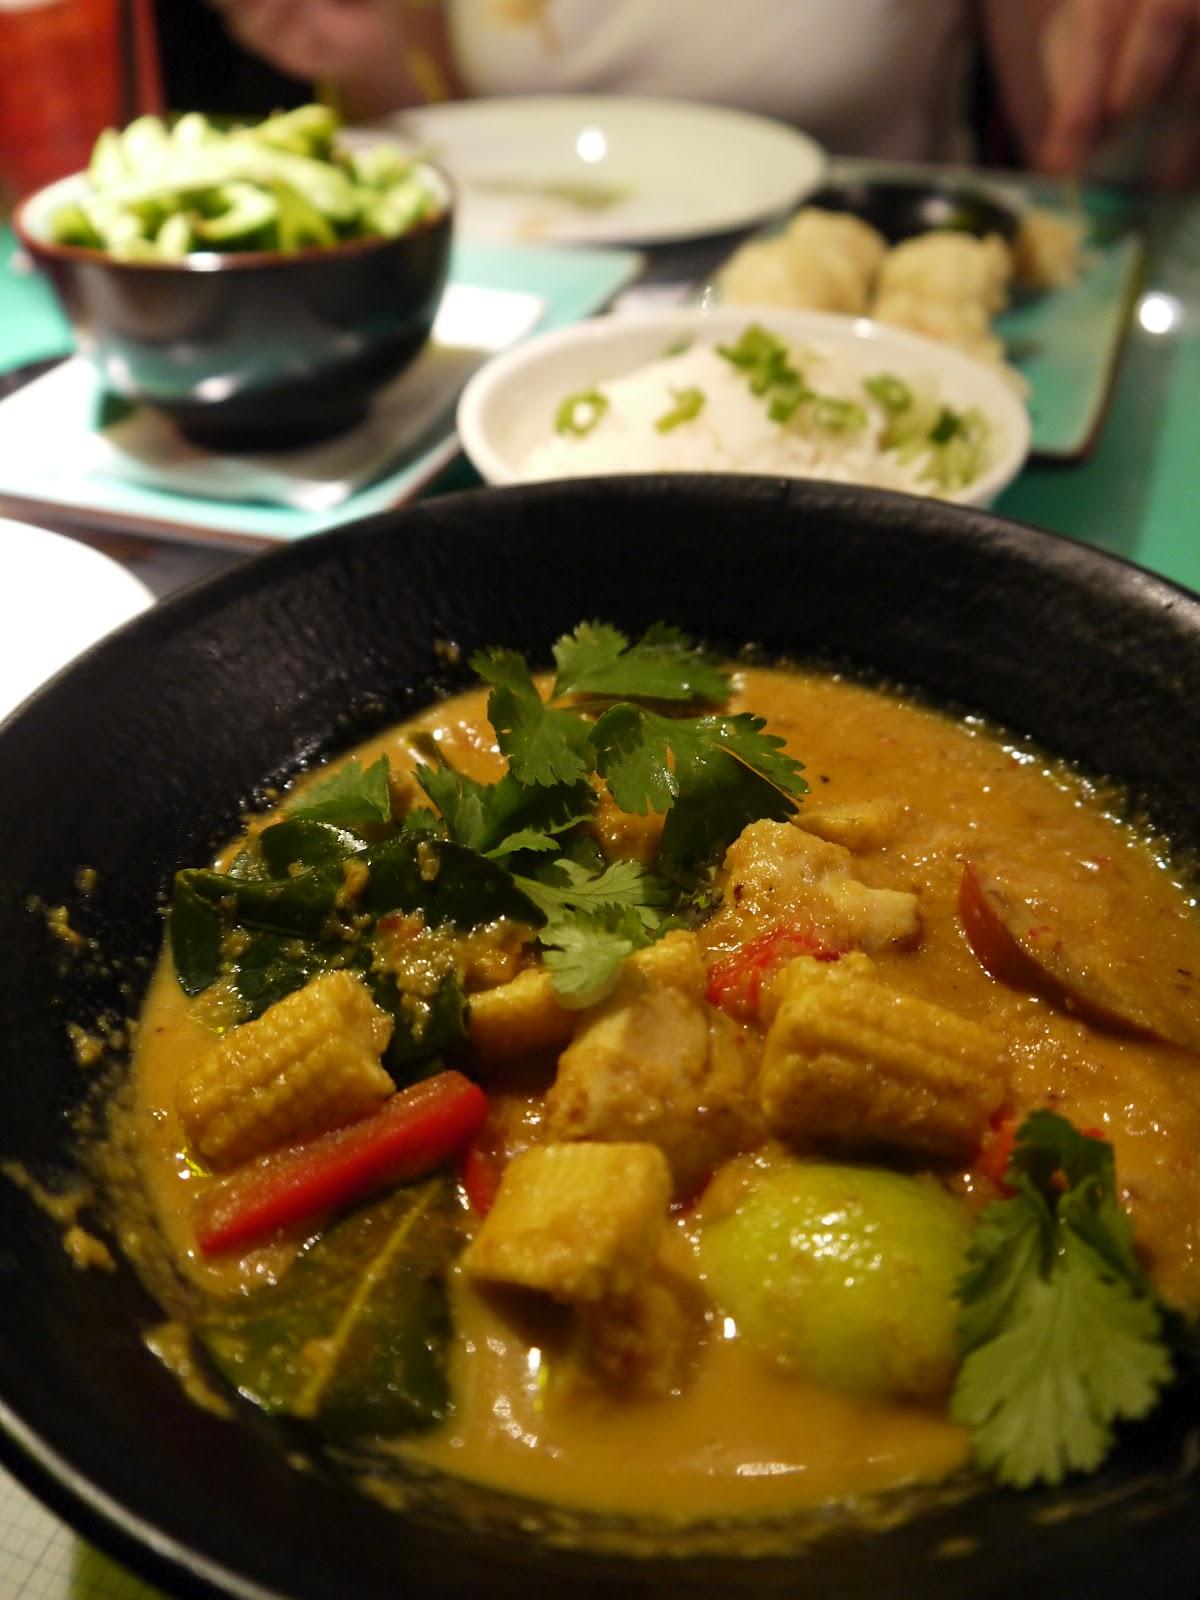 Sunshinedays east street for The east asian dining t nagar